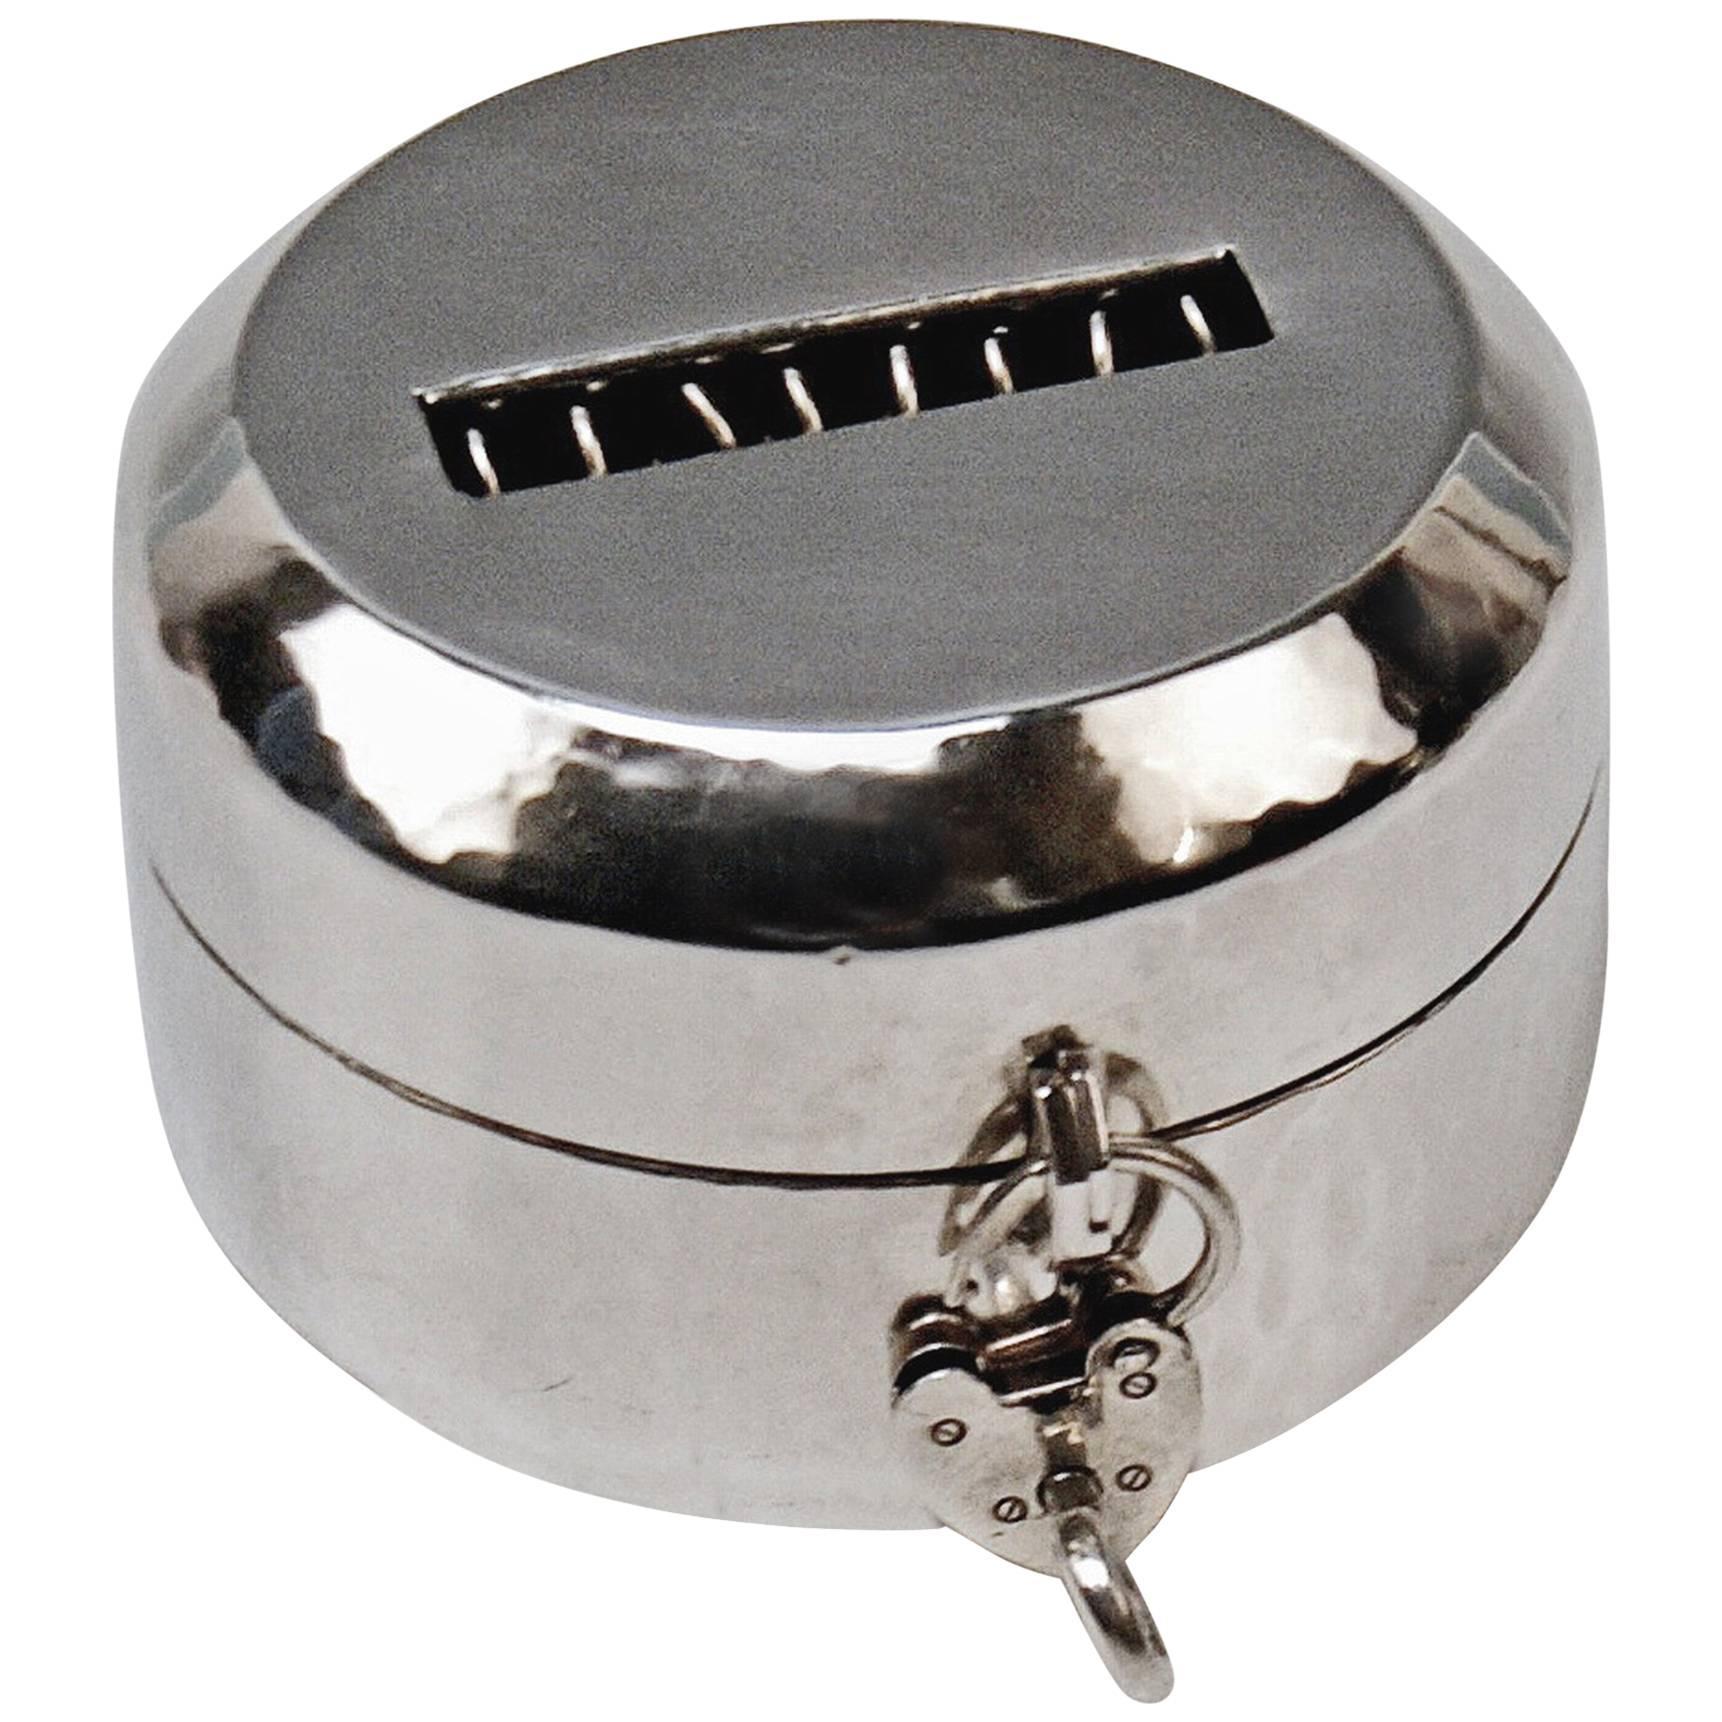 Money Box Piggy Bank Silver 830 Art Deco Jacob Grimminger Germany made 1930